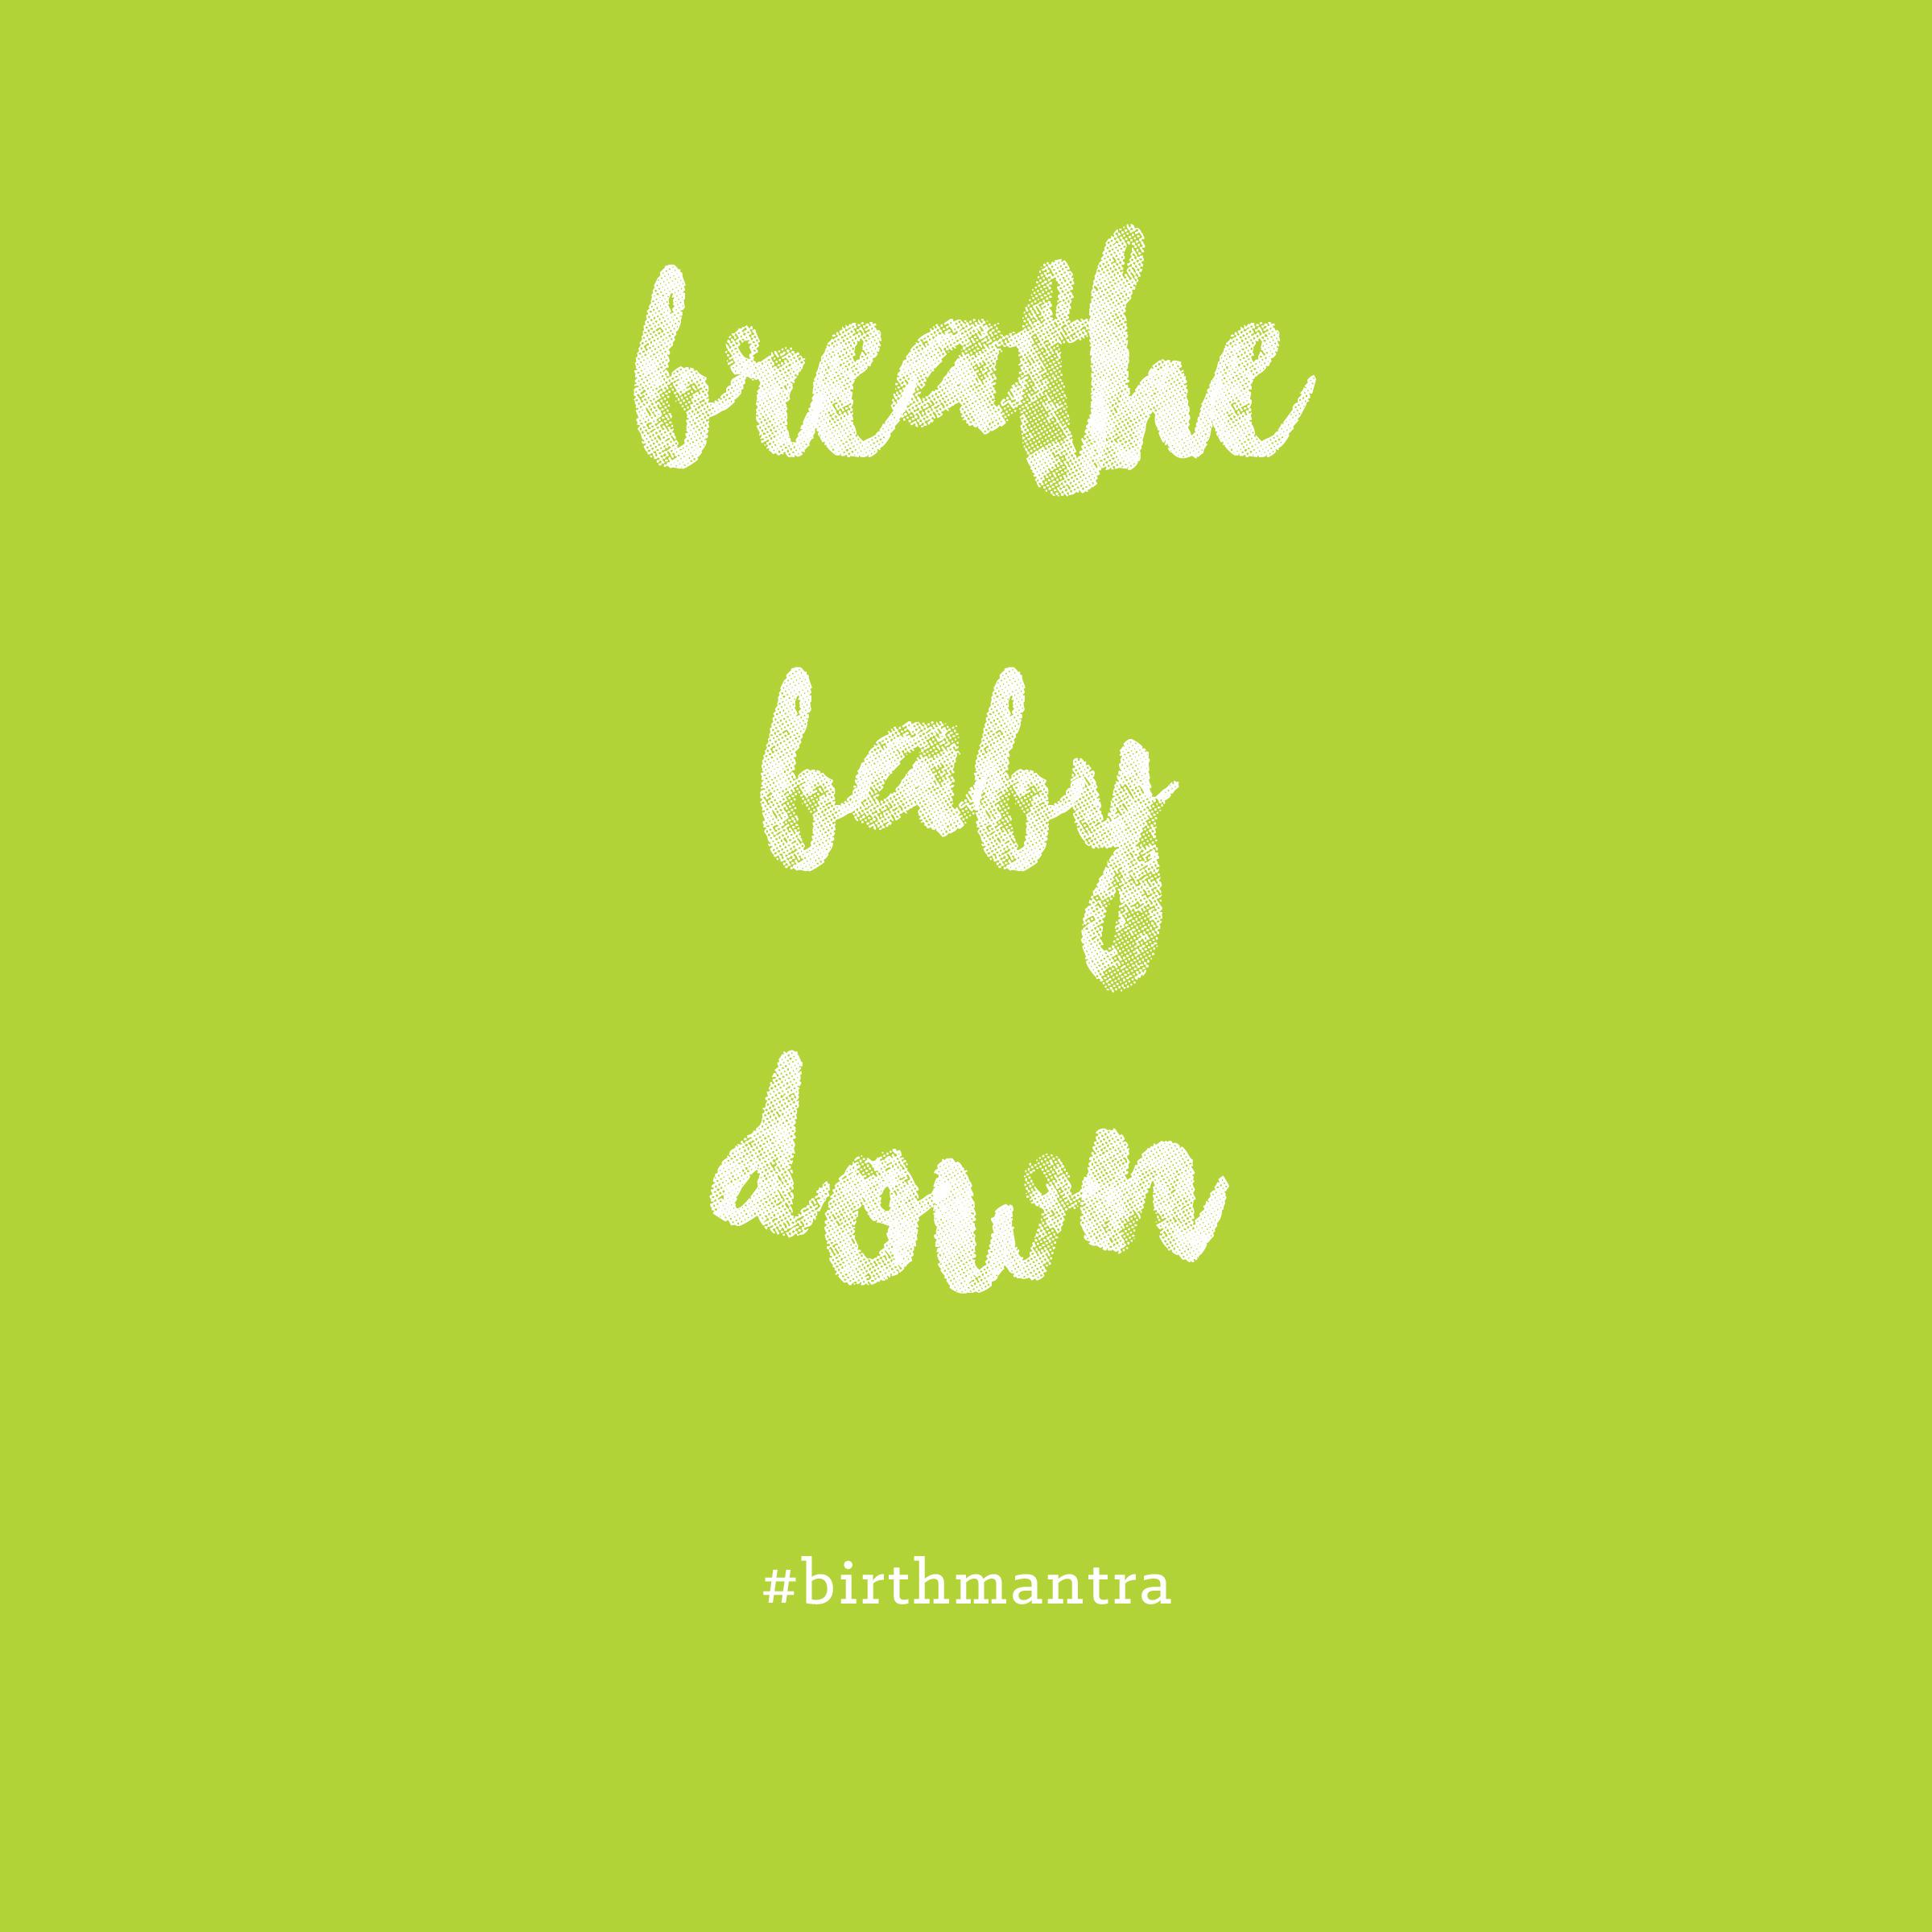 mantra- breathe baby down